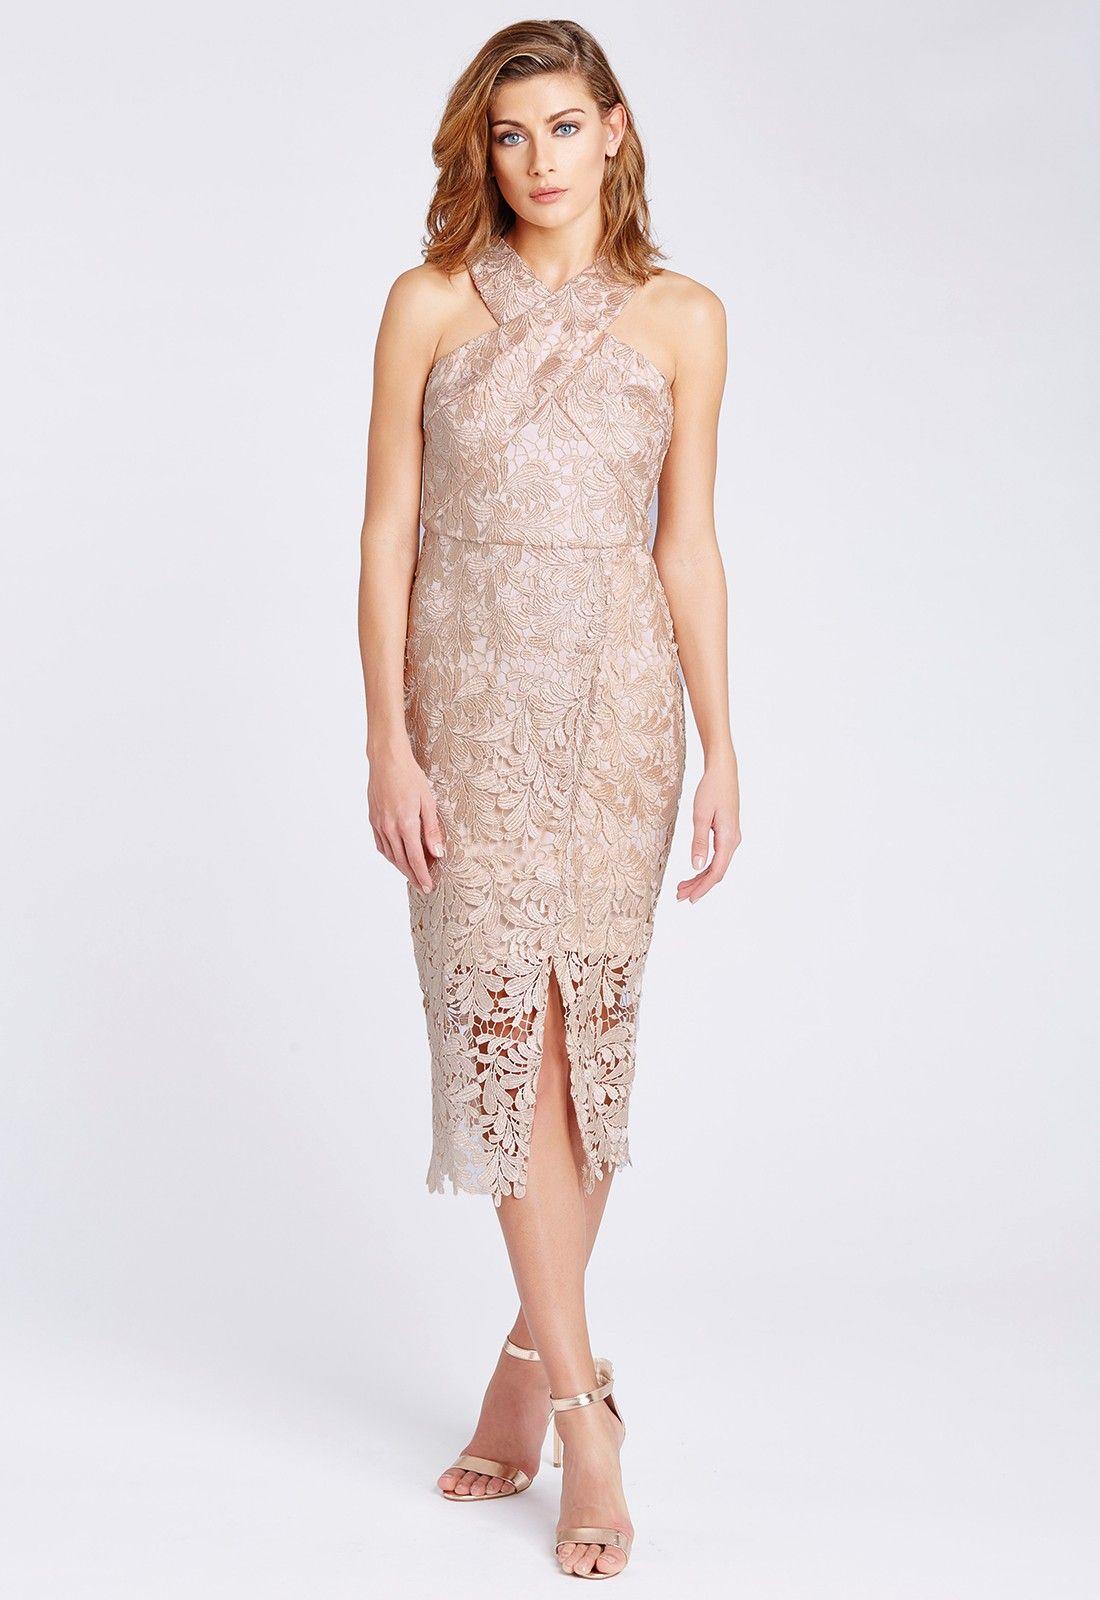 Danna cross front lace midi dress in nude lace midi dress front